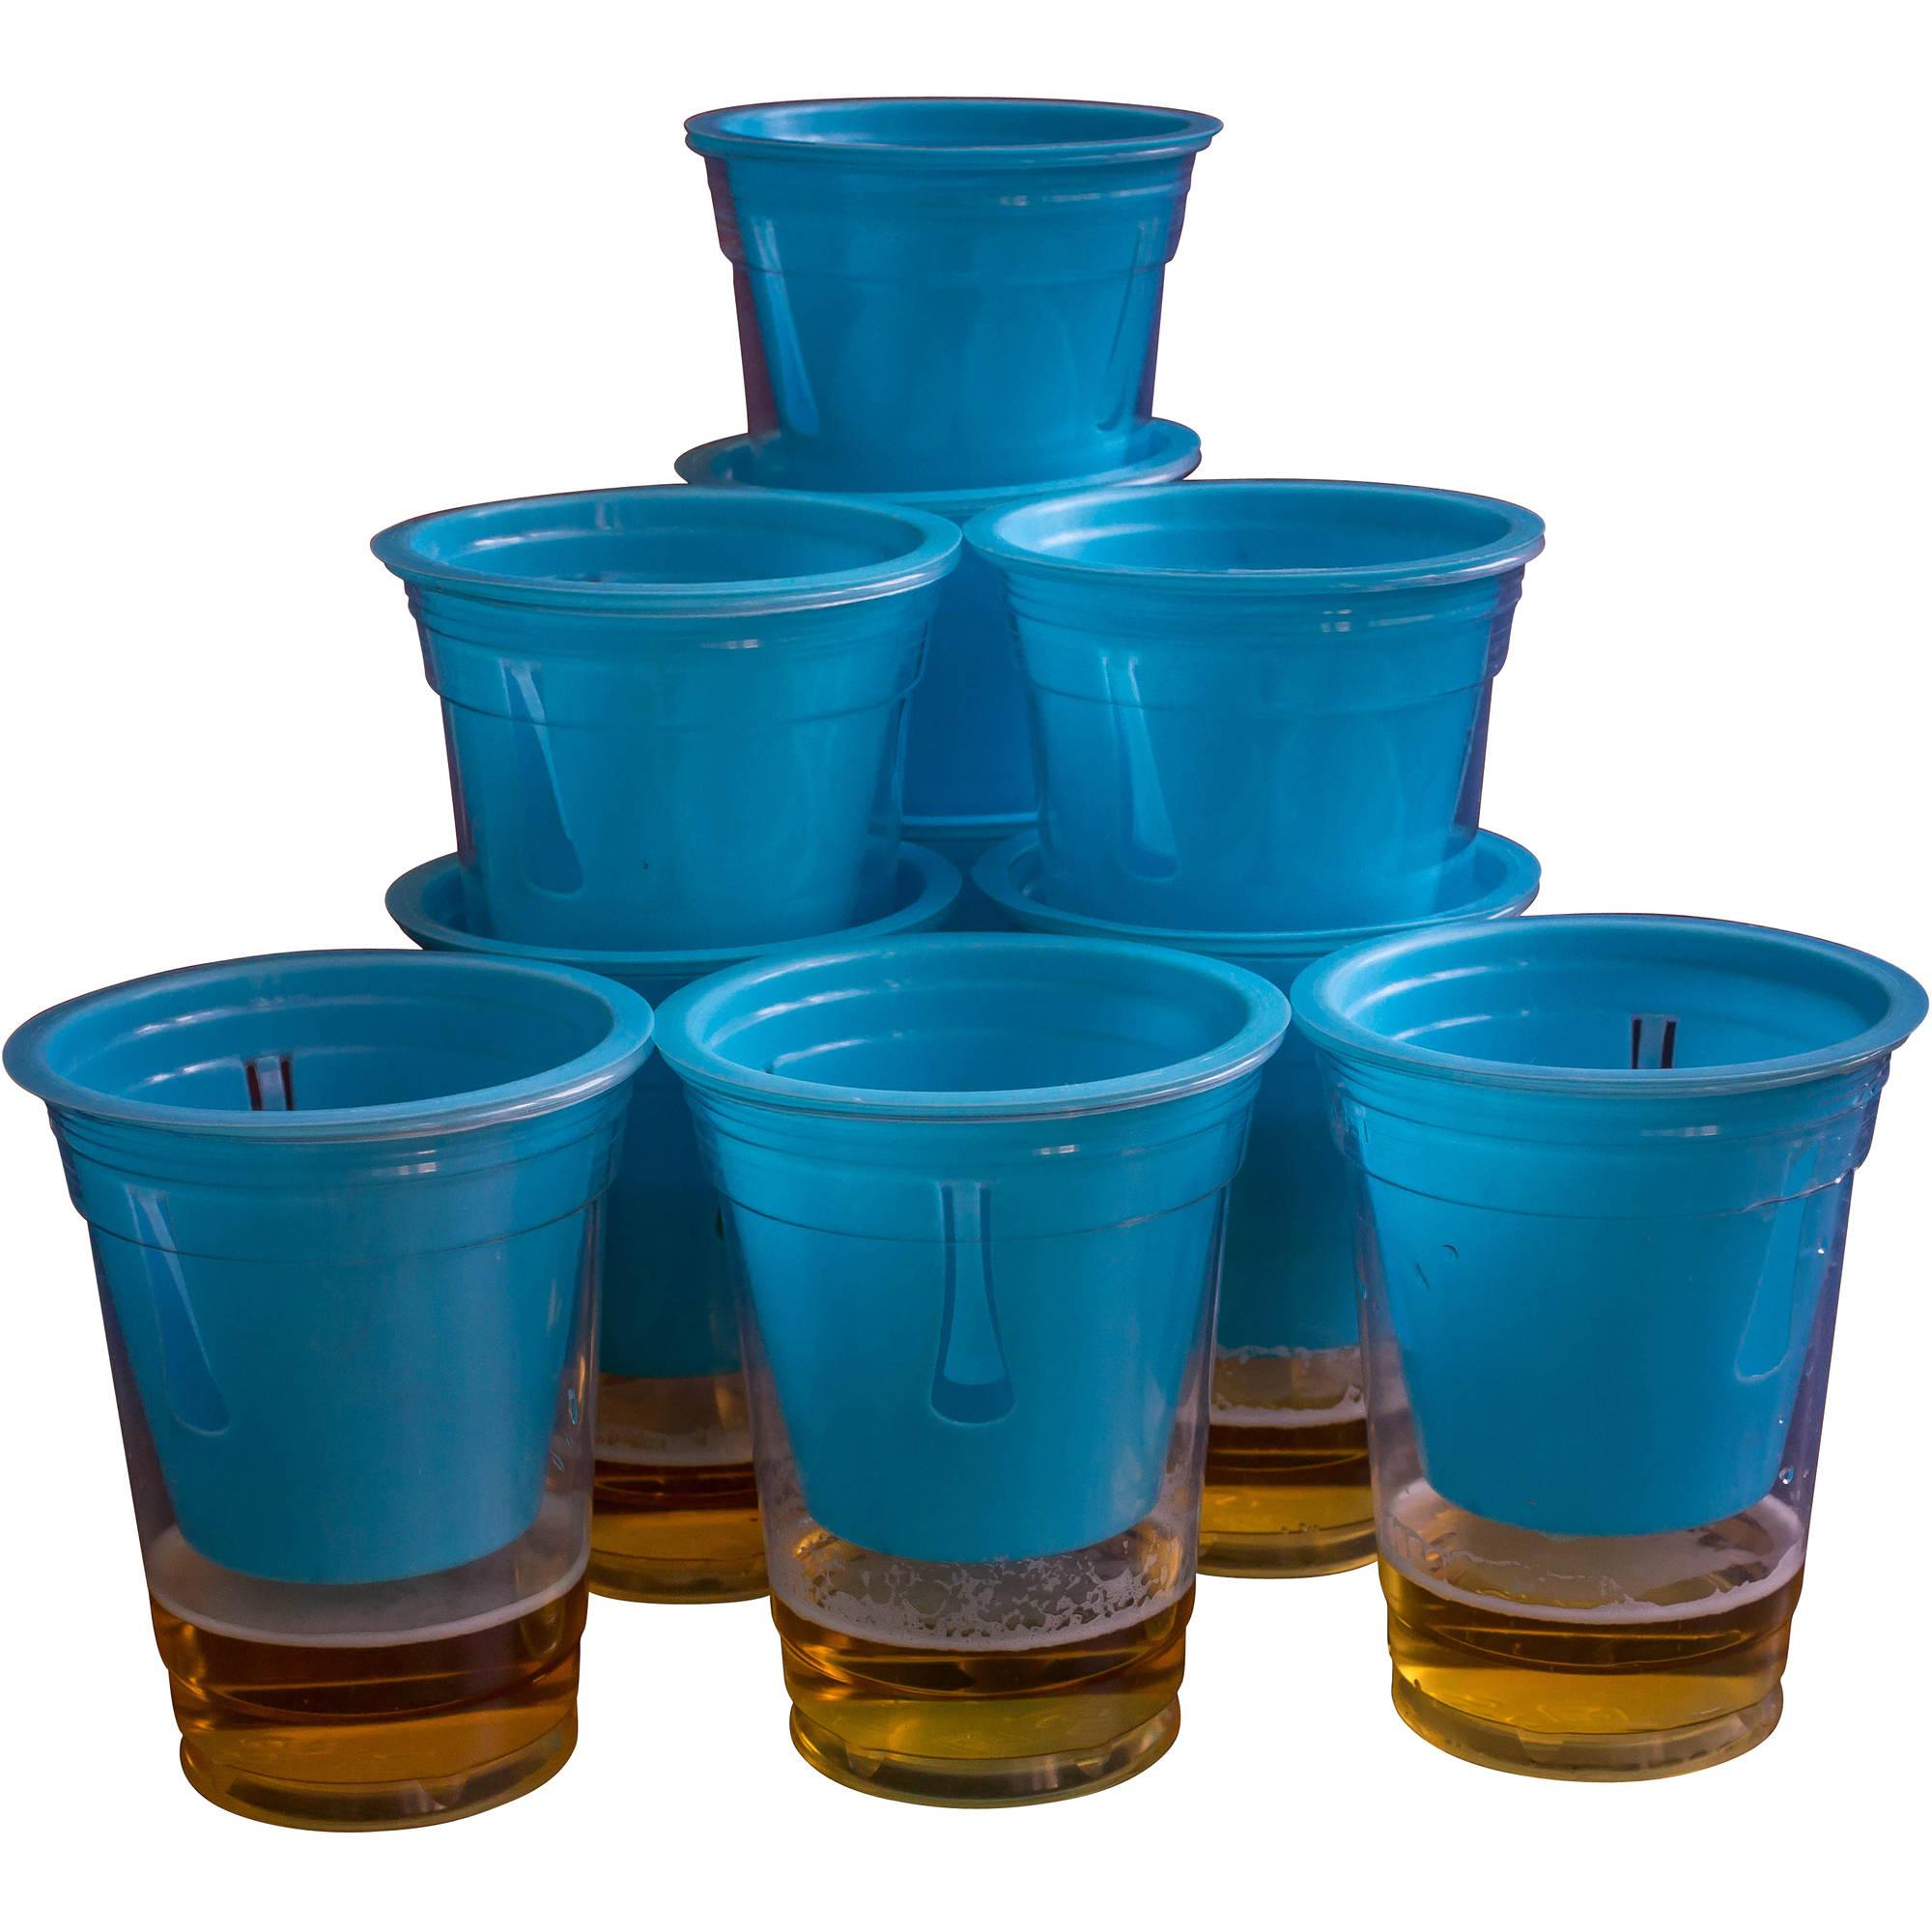 Slip Cup: Clean Pong